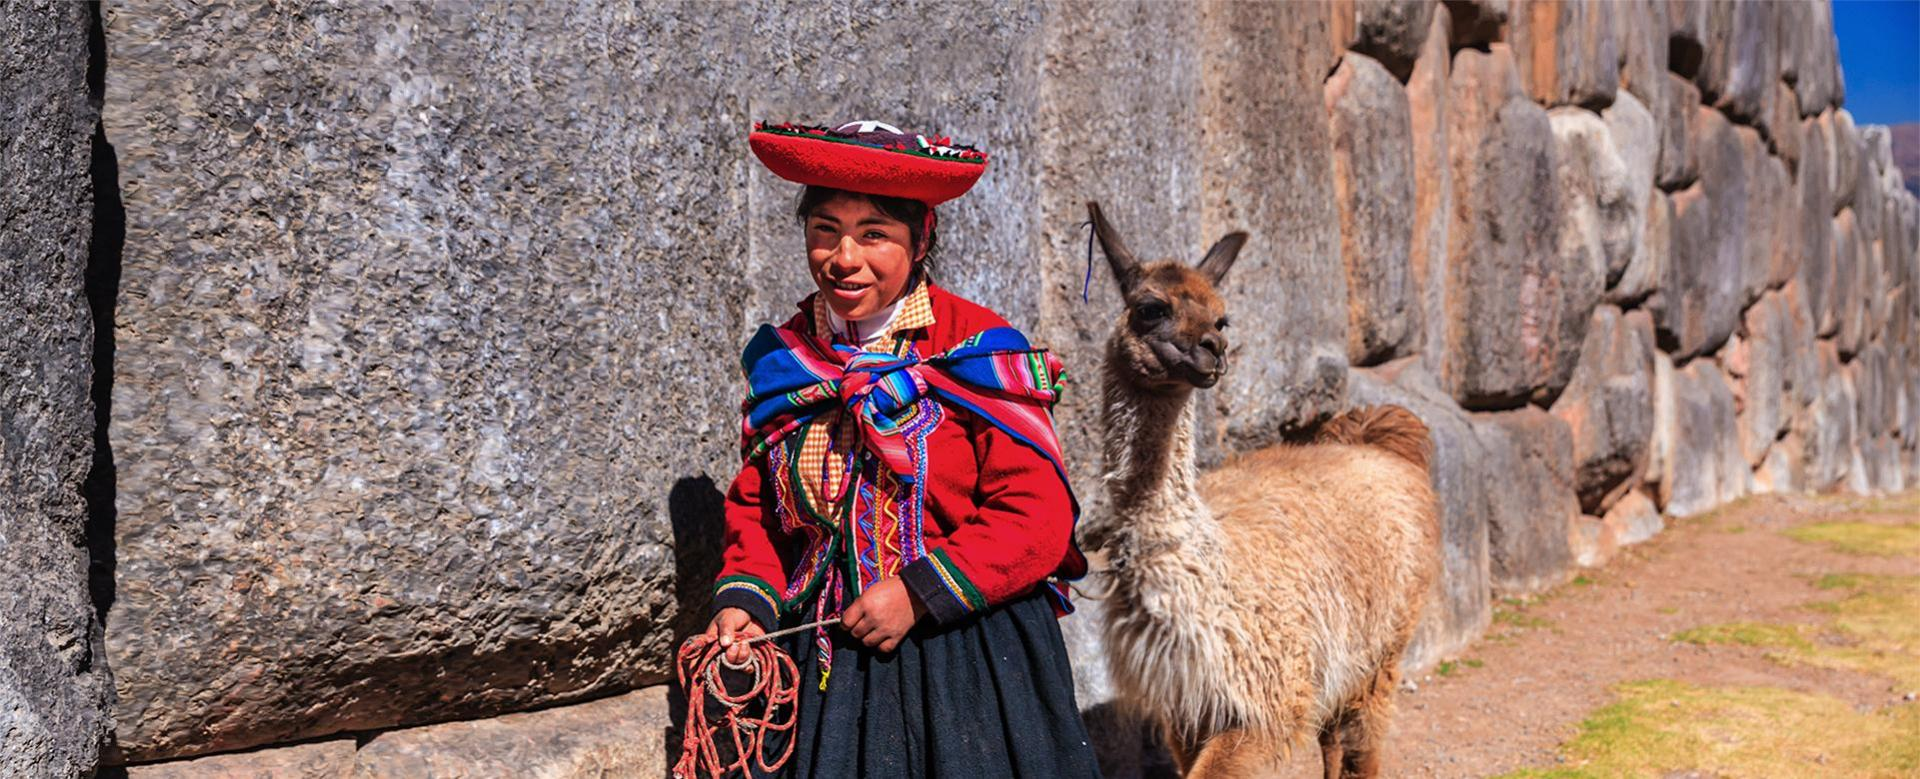 Voyage à pied : Du machu picchu à la cordillère blanche